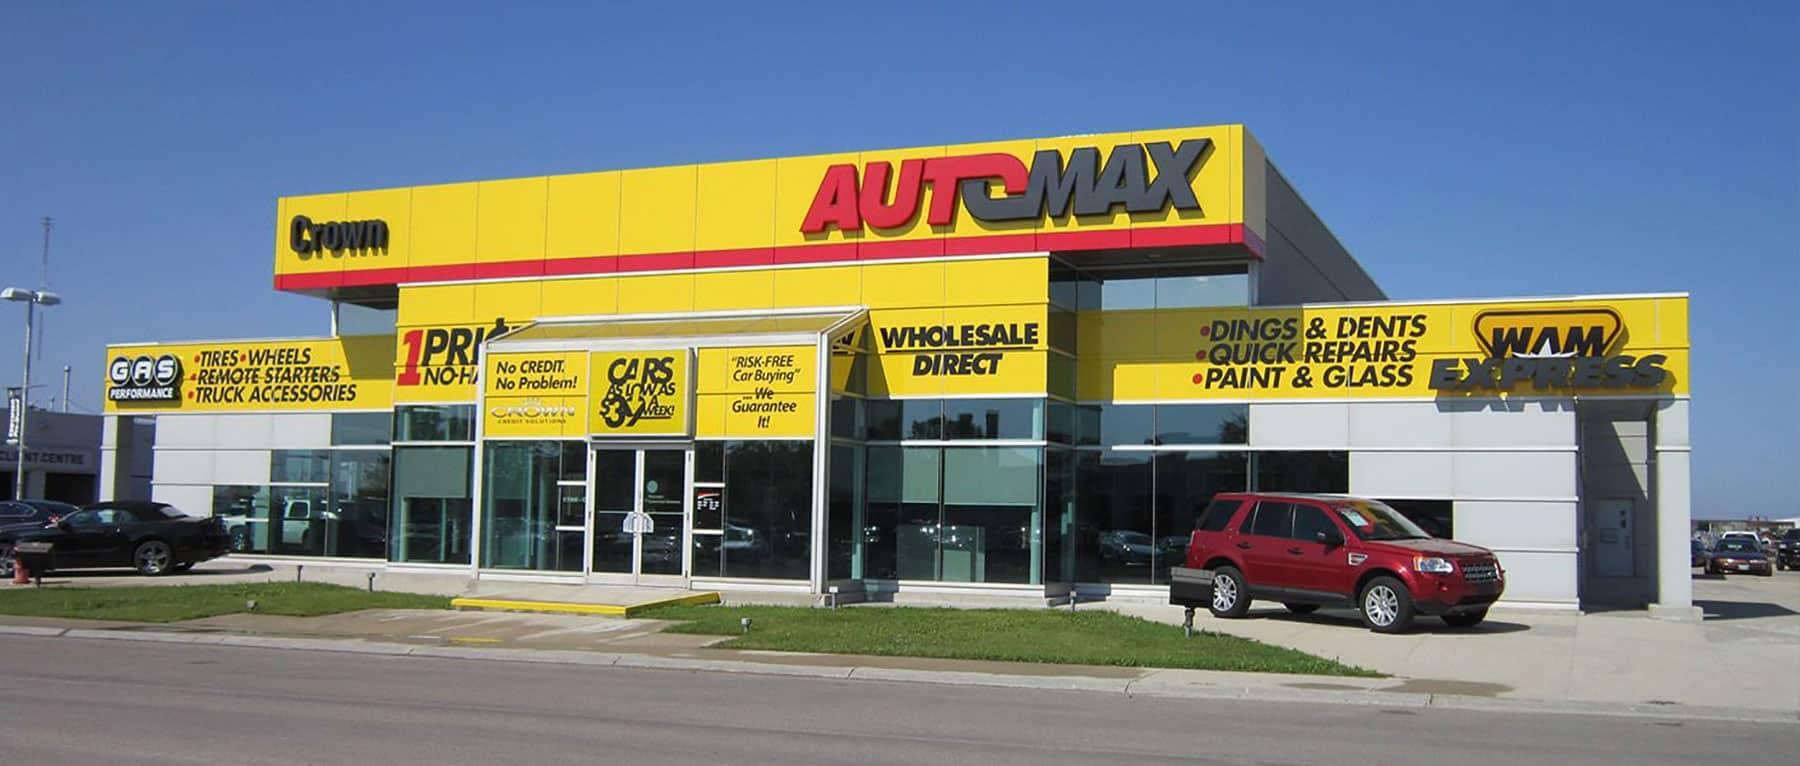 Crown-Automax